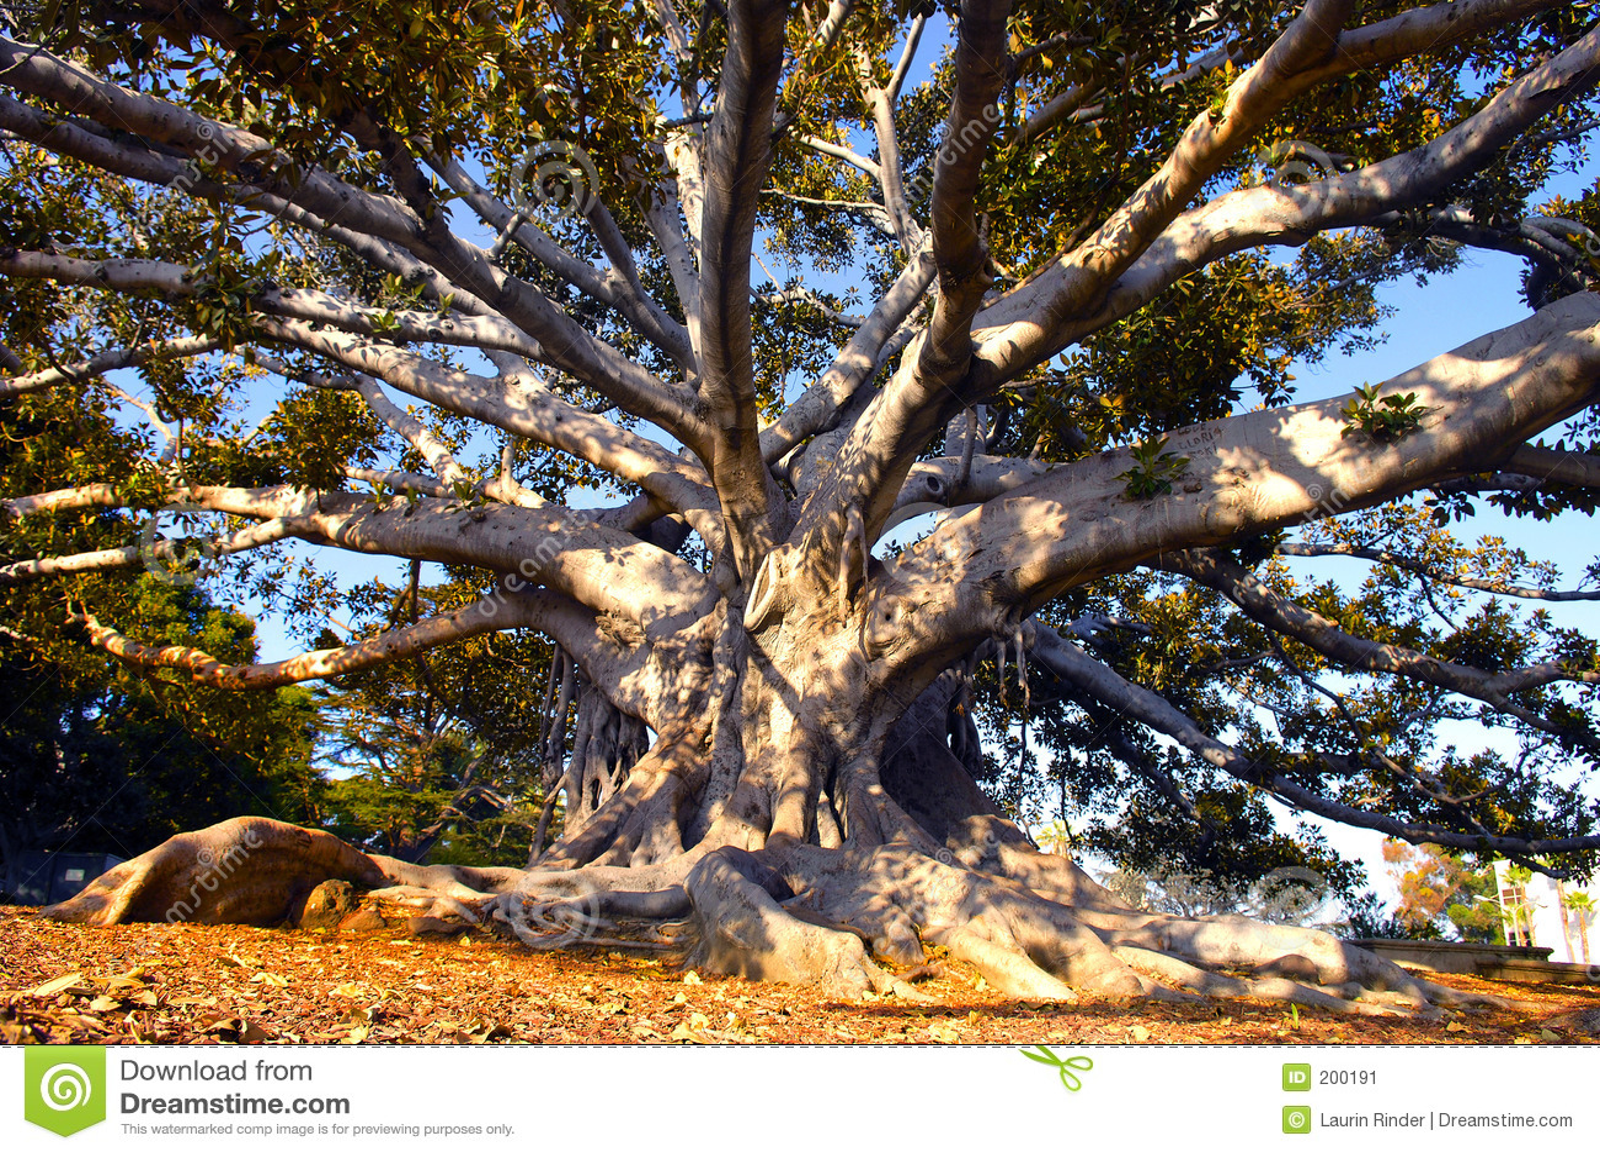 Beverly Hills tree